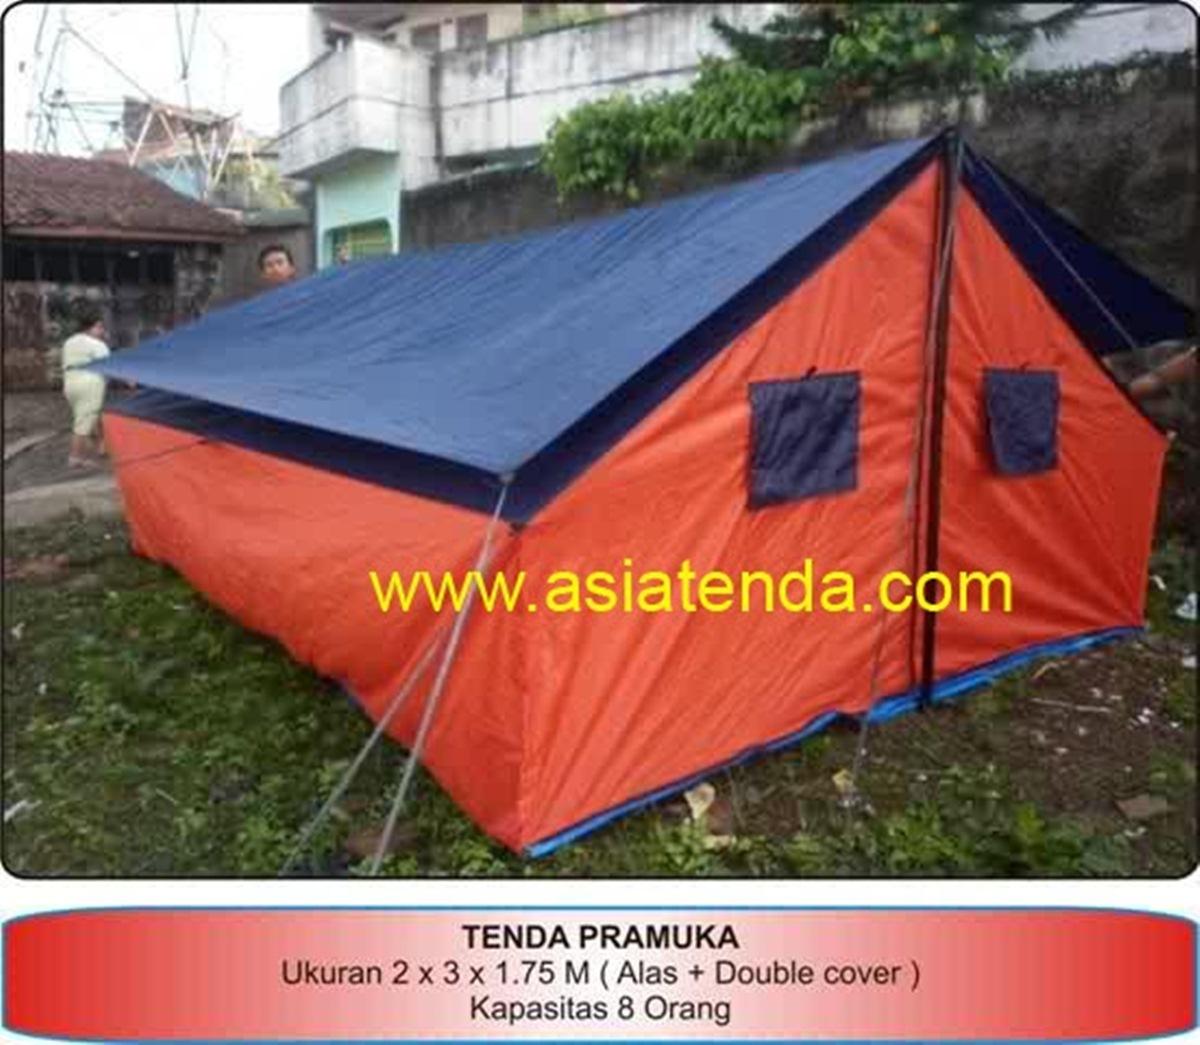 portofolio tenda pramuka amp